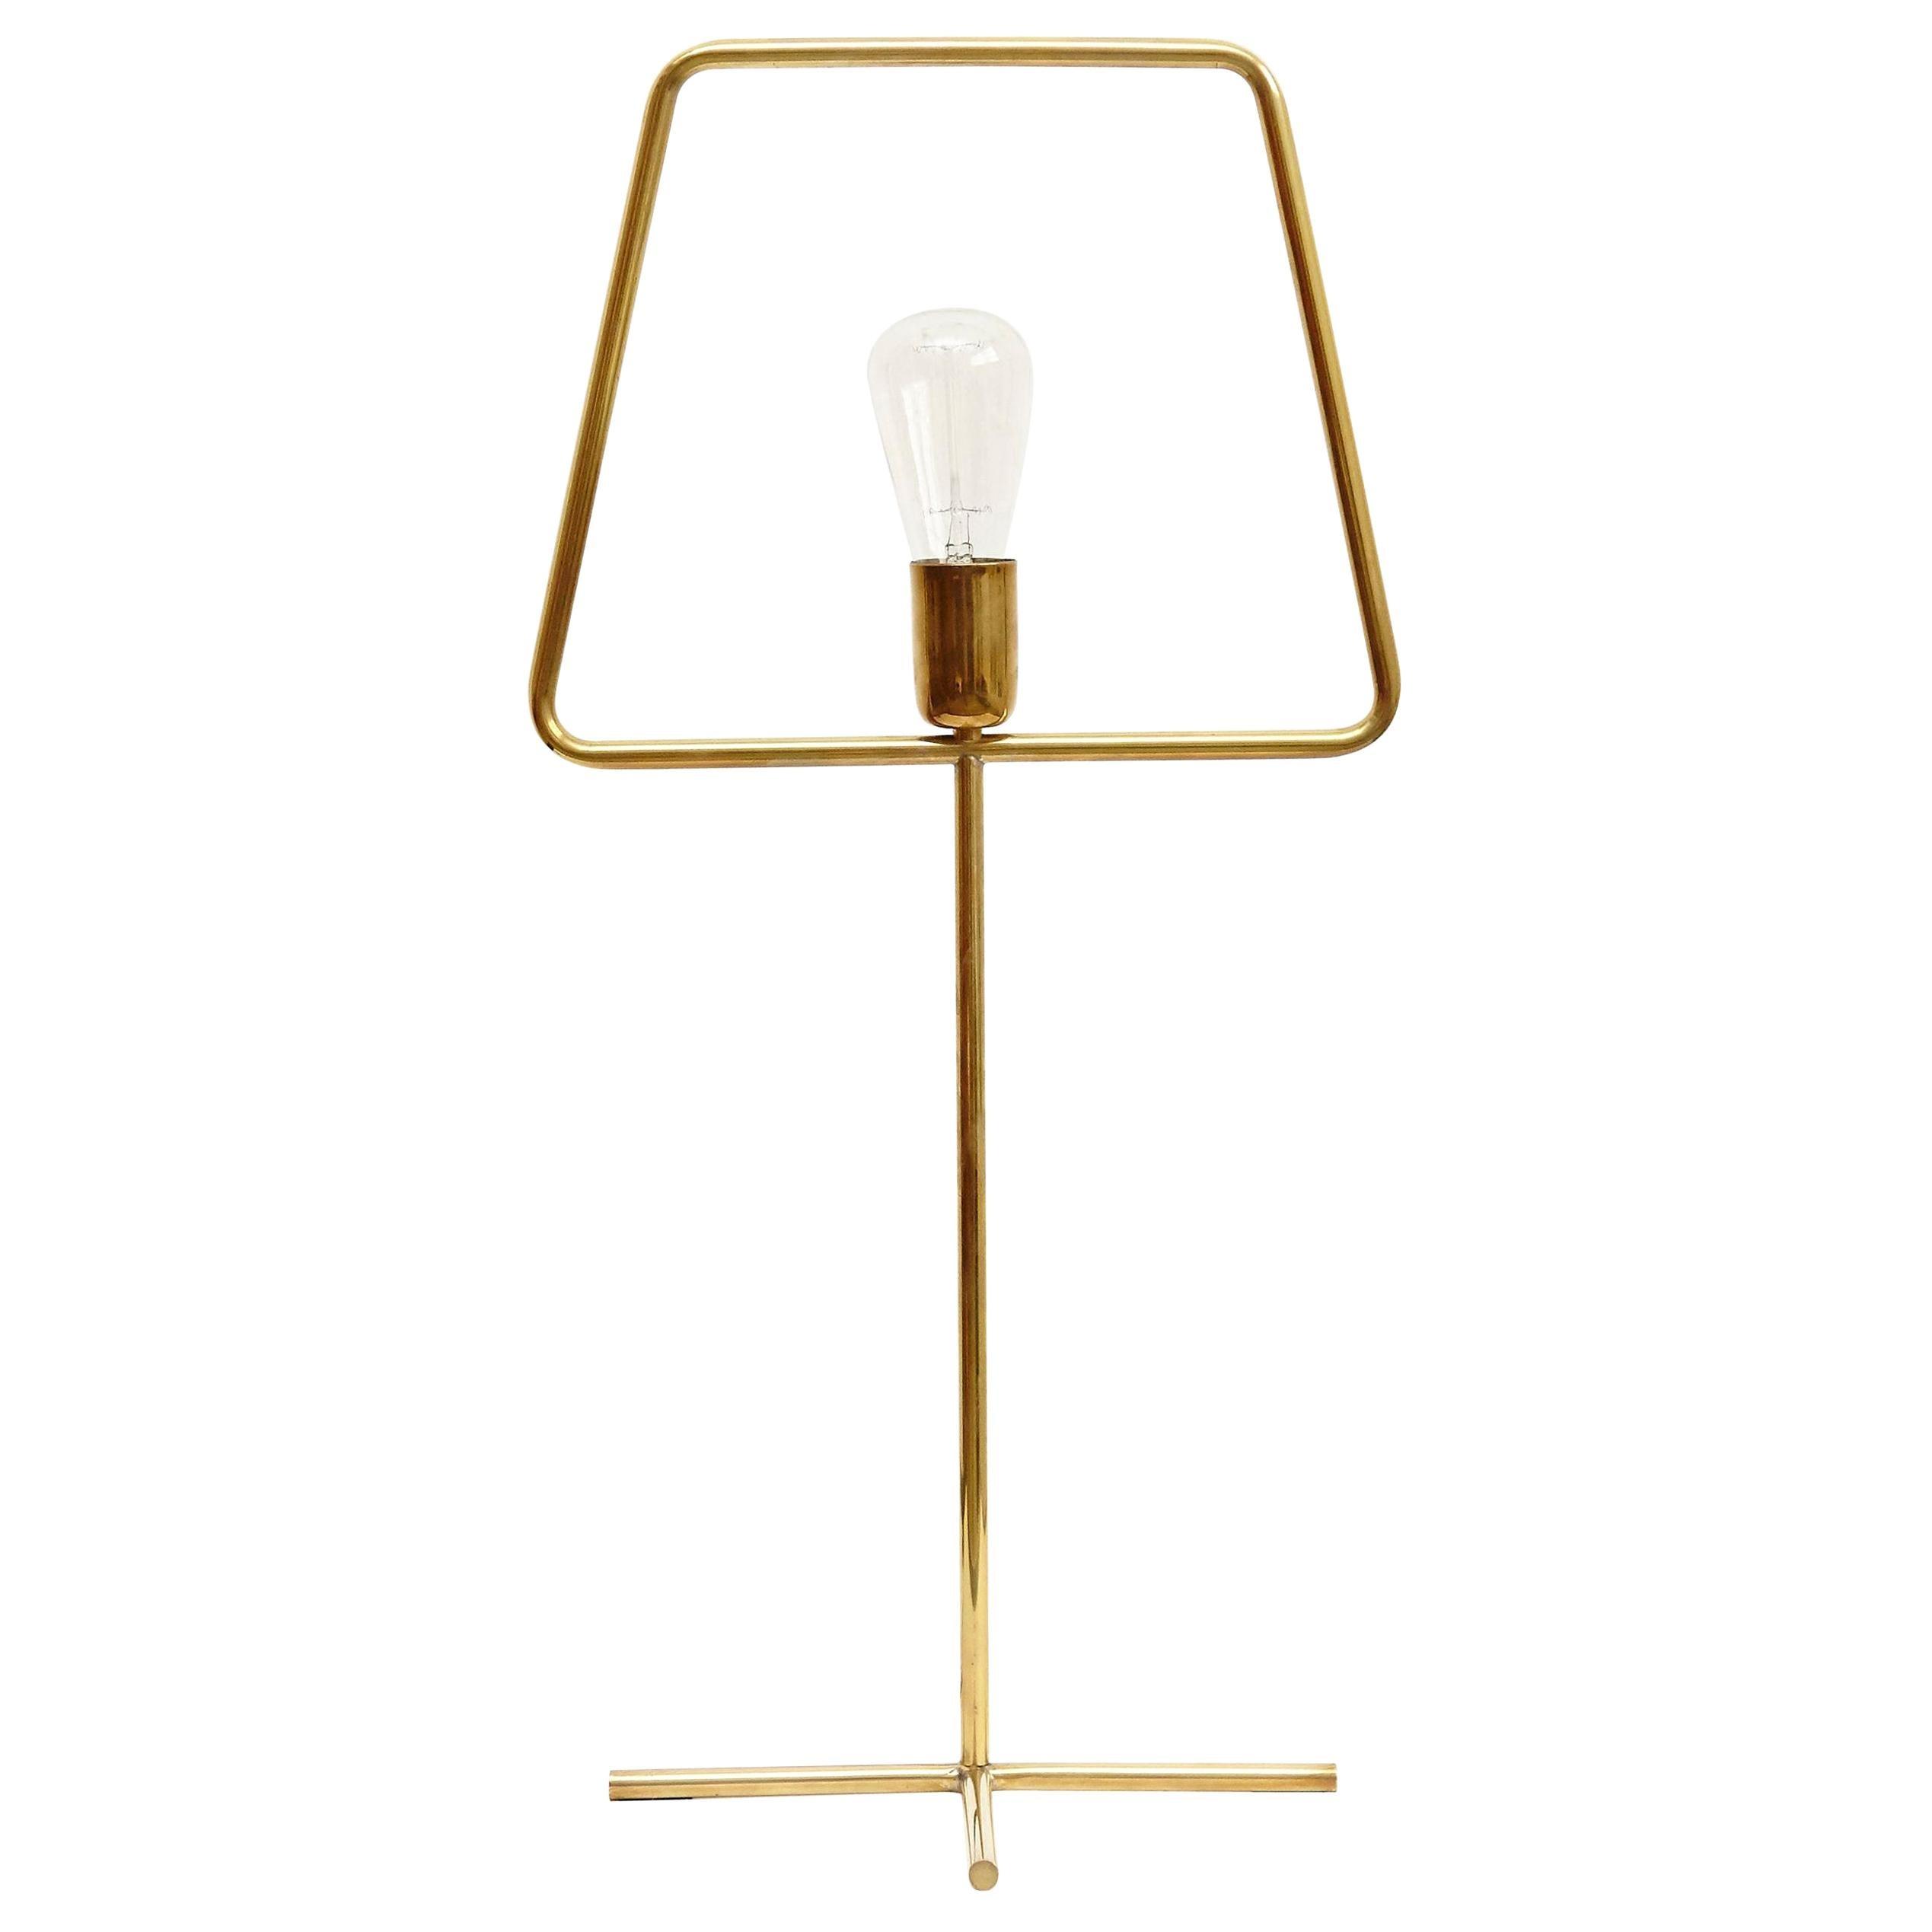 Adolfo Abejon Contemporary Design 'Slim Brass' Lamp Prototype in Brass, 2016